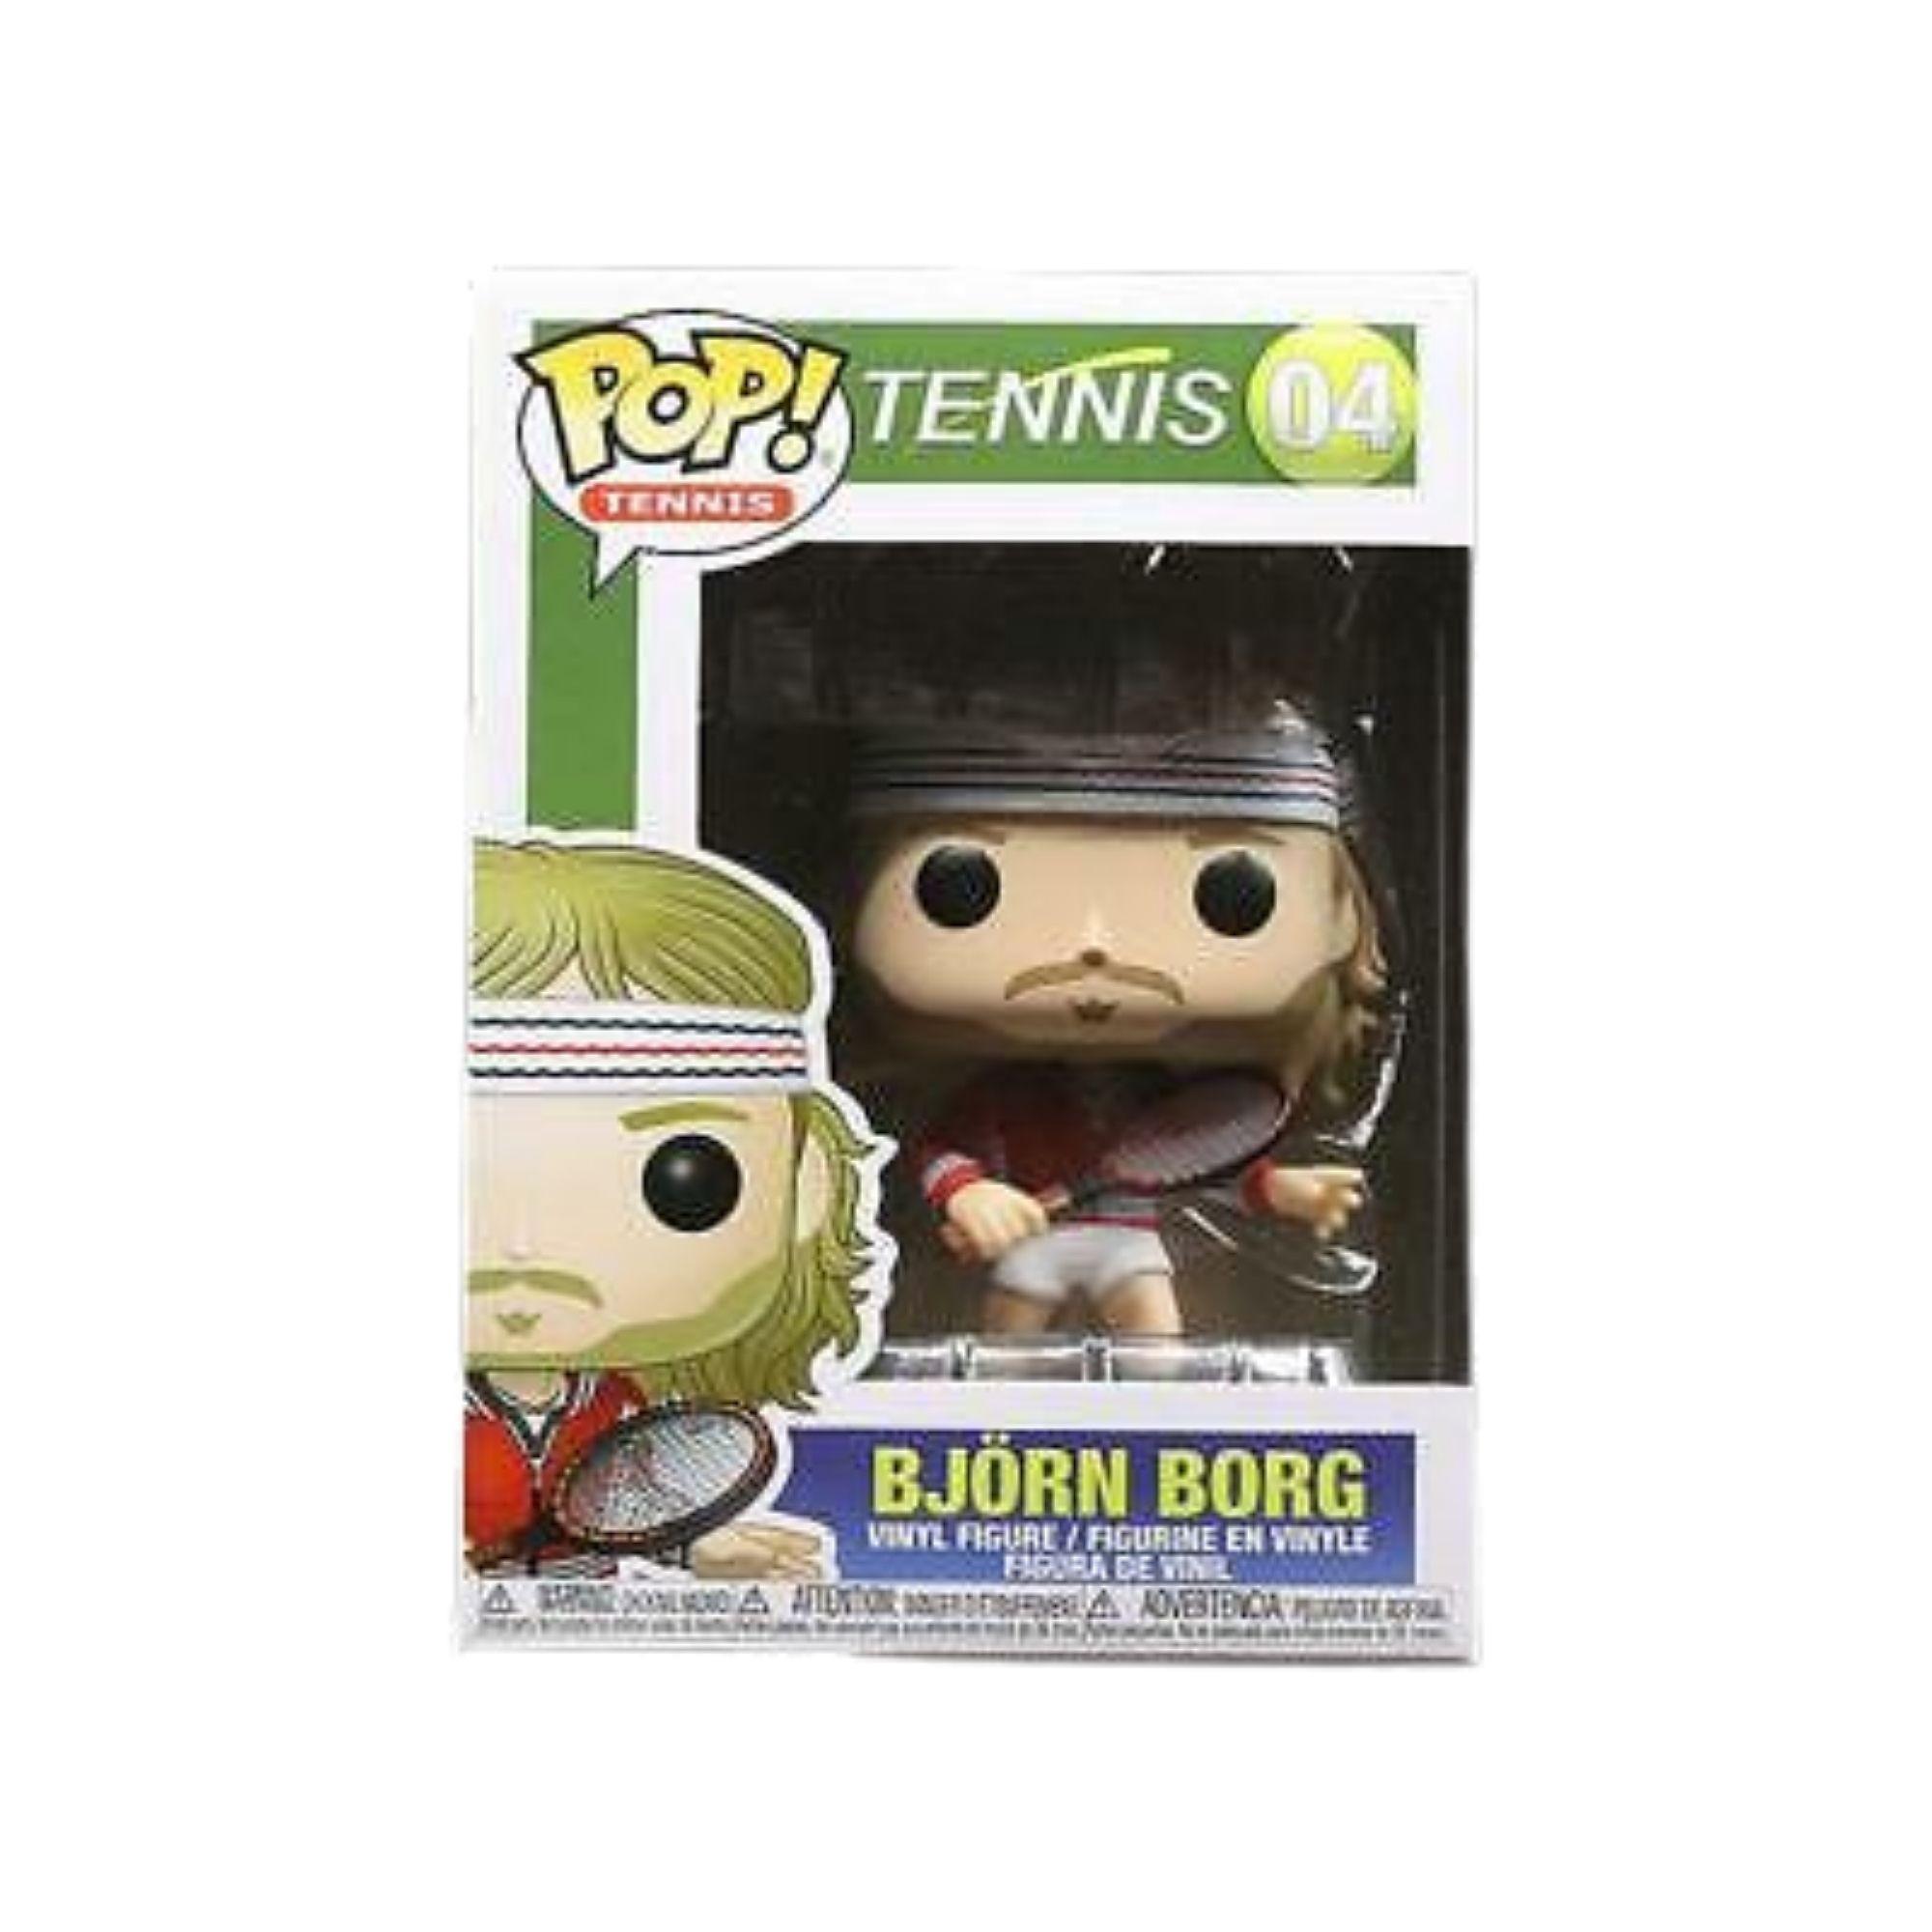 Funko Pop Tennis Bjorn Borg #04  - Game Land Brinquedos